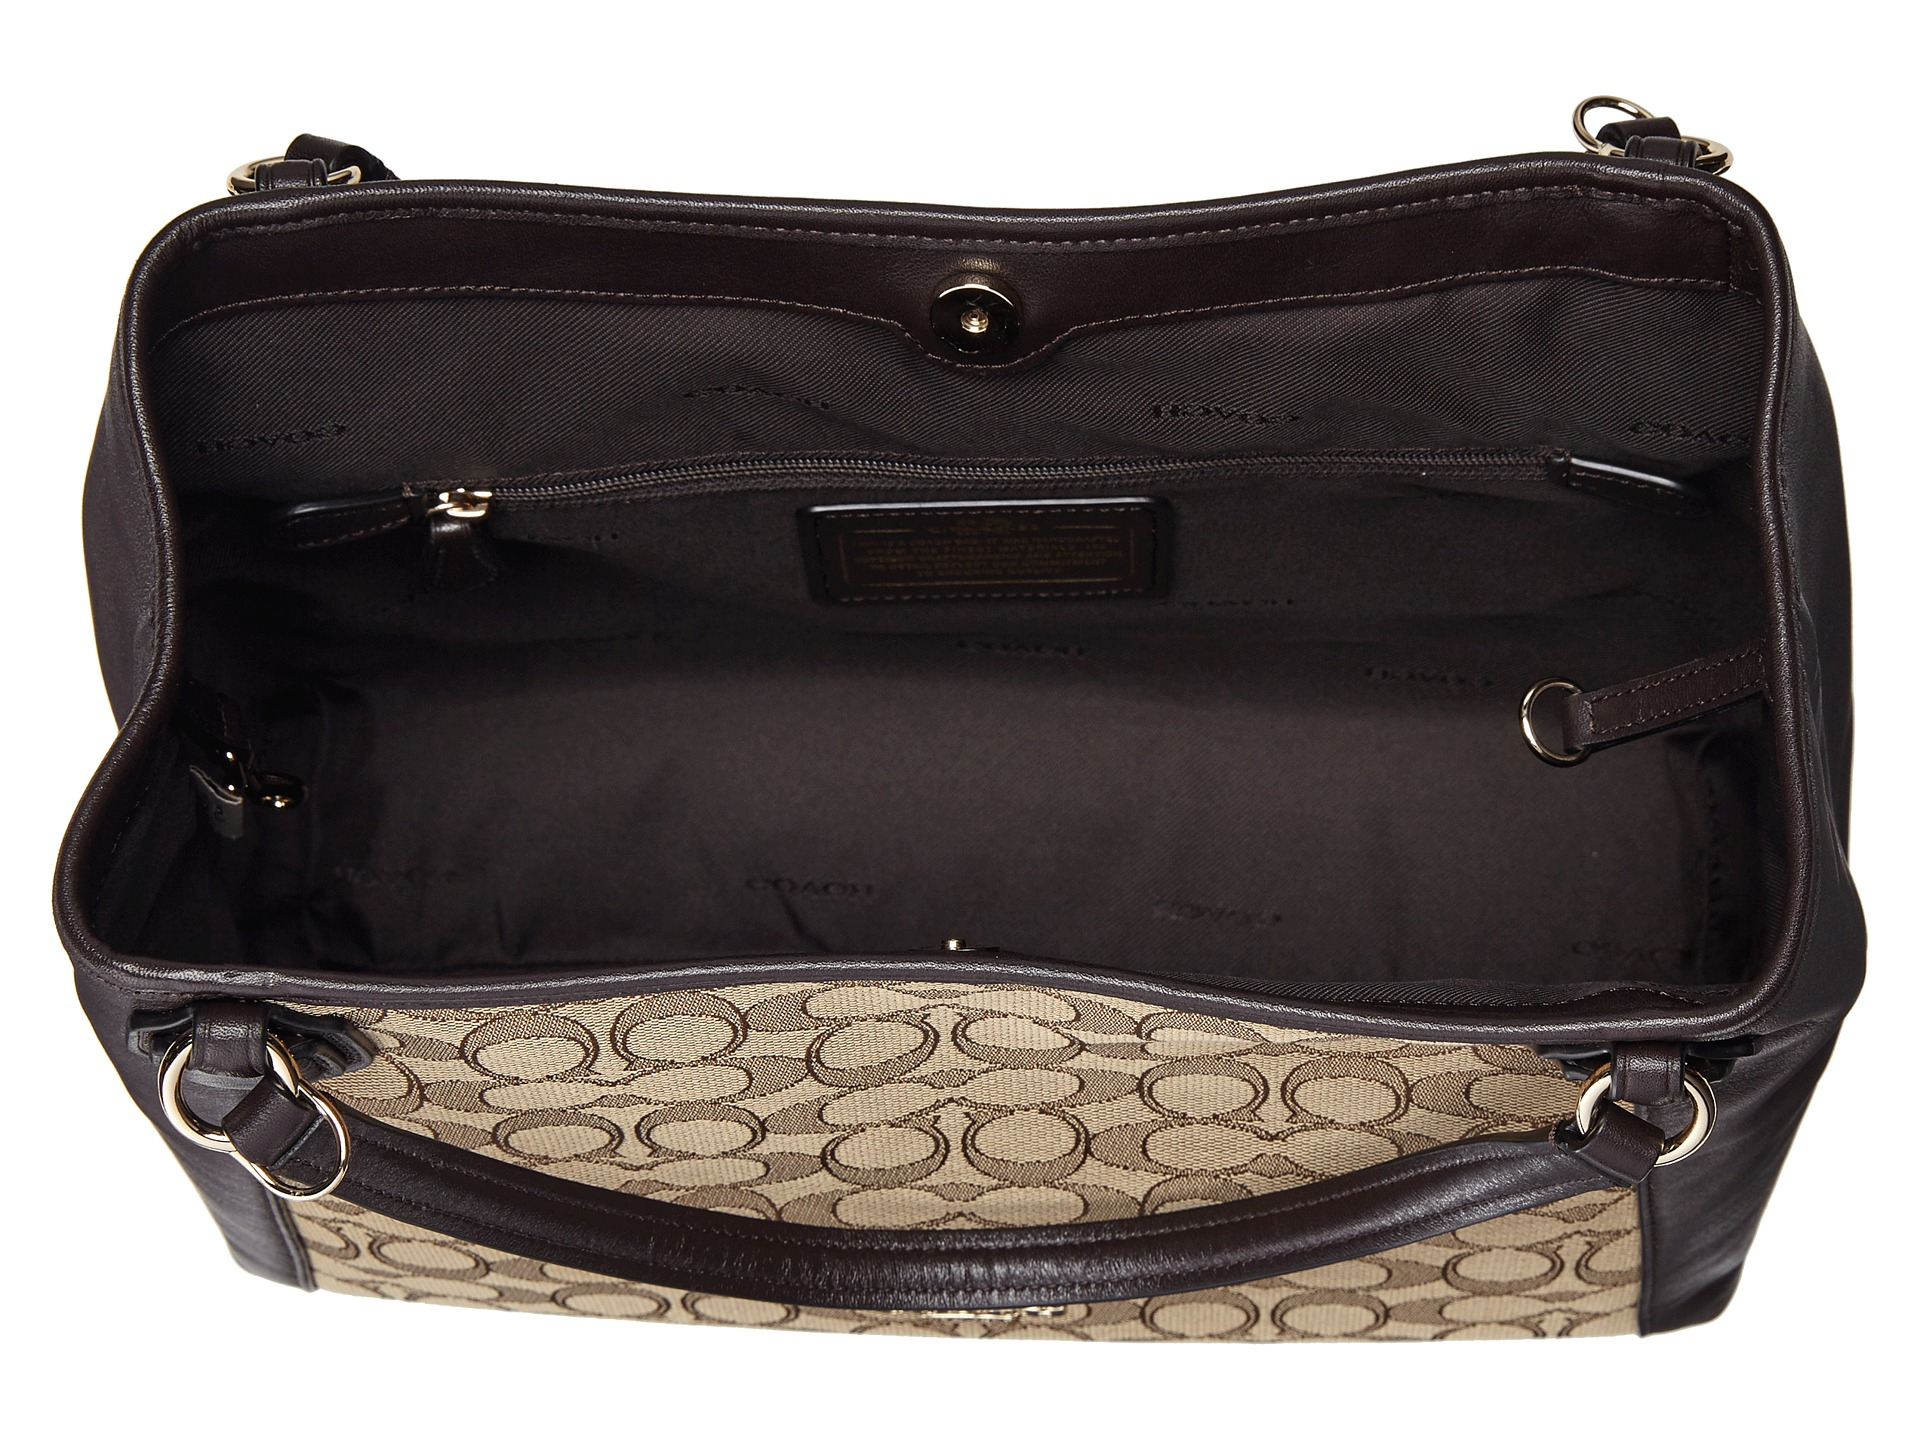 a2db1c083c hot coach pebbled leather edie 31 shoulder bag li black handbags fc676  6e318  ebay lyst coach signature edie 28 shoulder bag in brown 11d0c 916a8